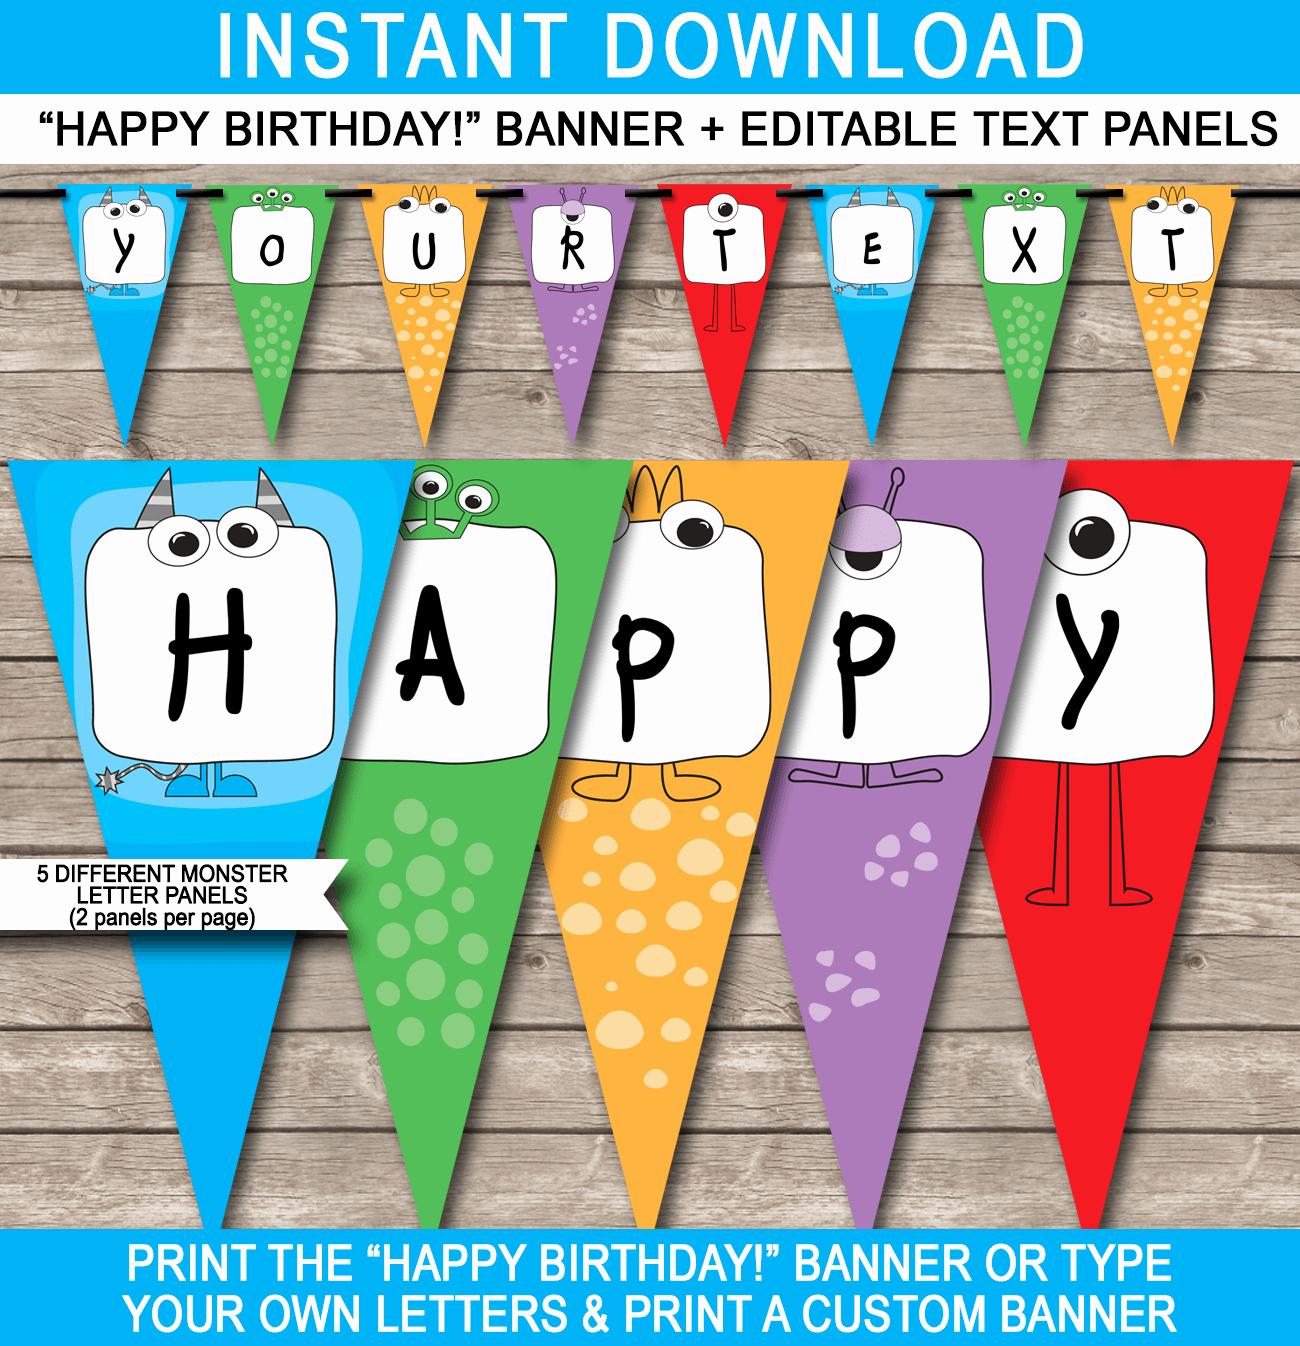 Happy Birthday Banner Template Printable Beautiful Monster Party Banner Template Birthday Banner